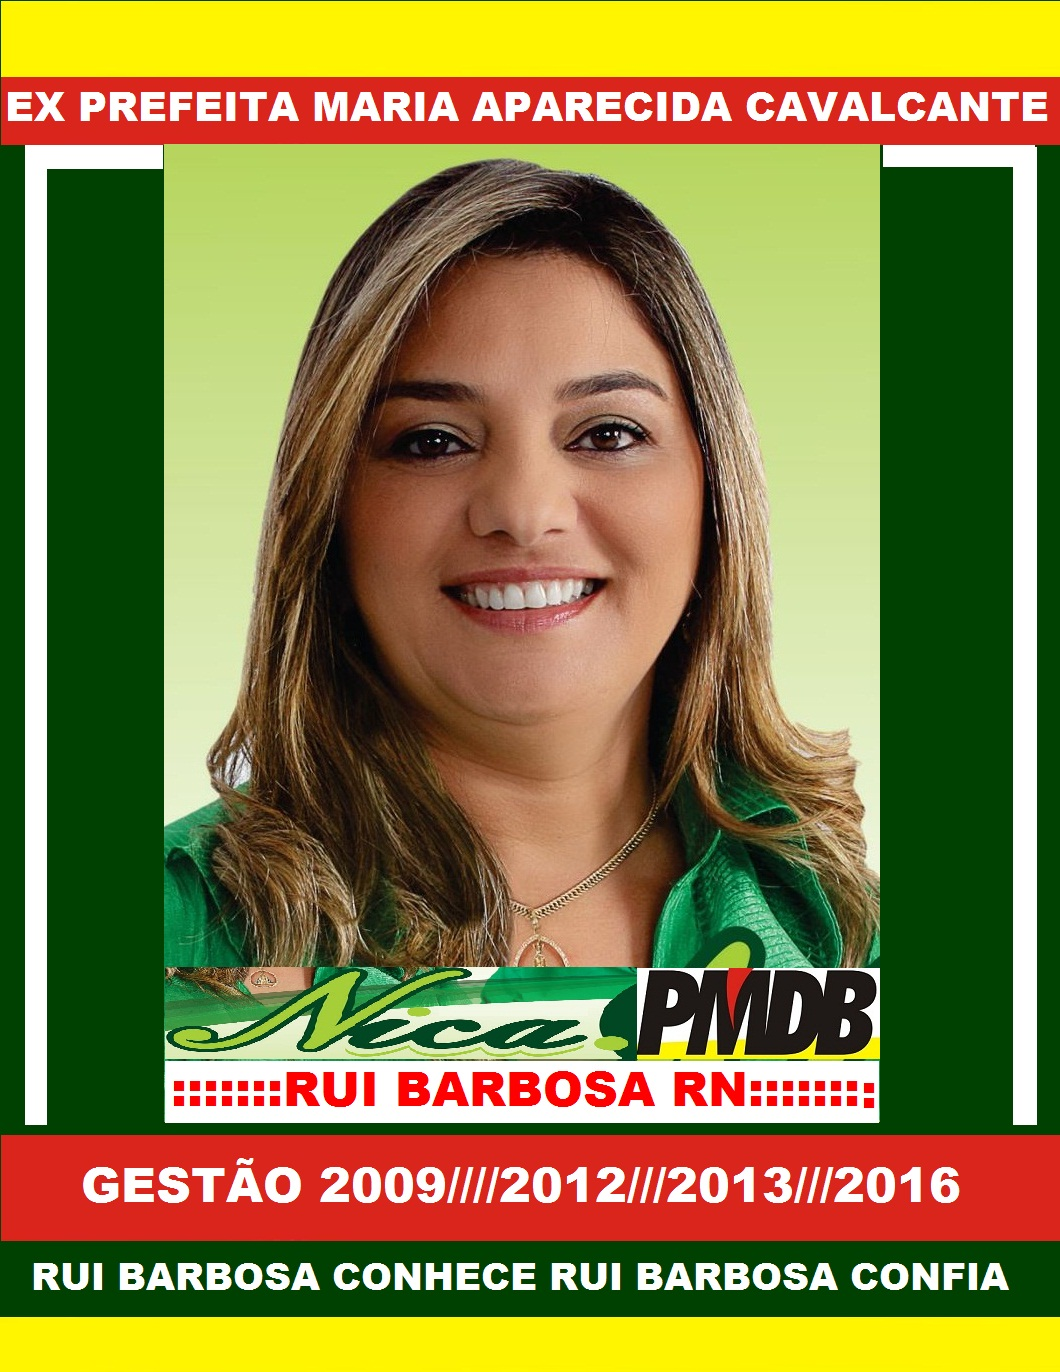 EX PREFEITA NICA RUI BARBOSA RN